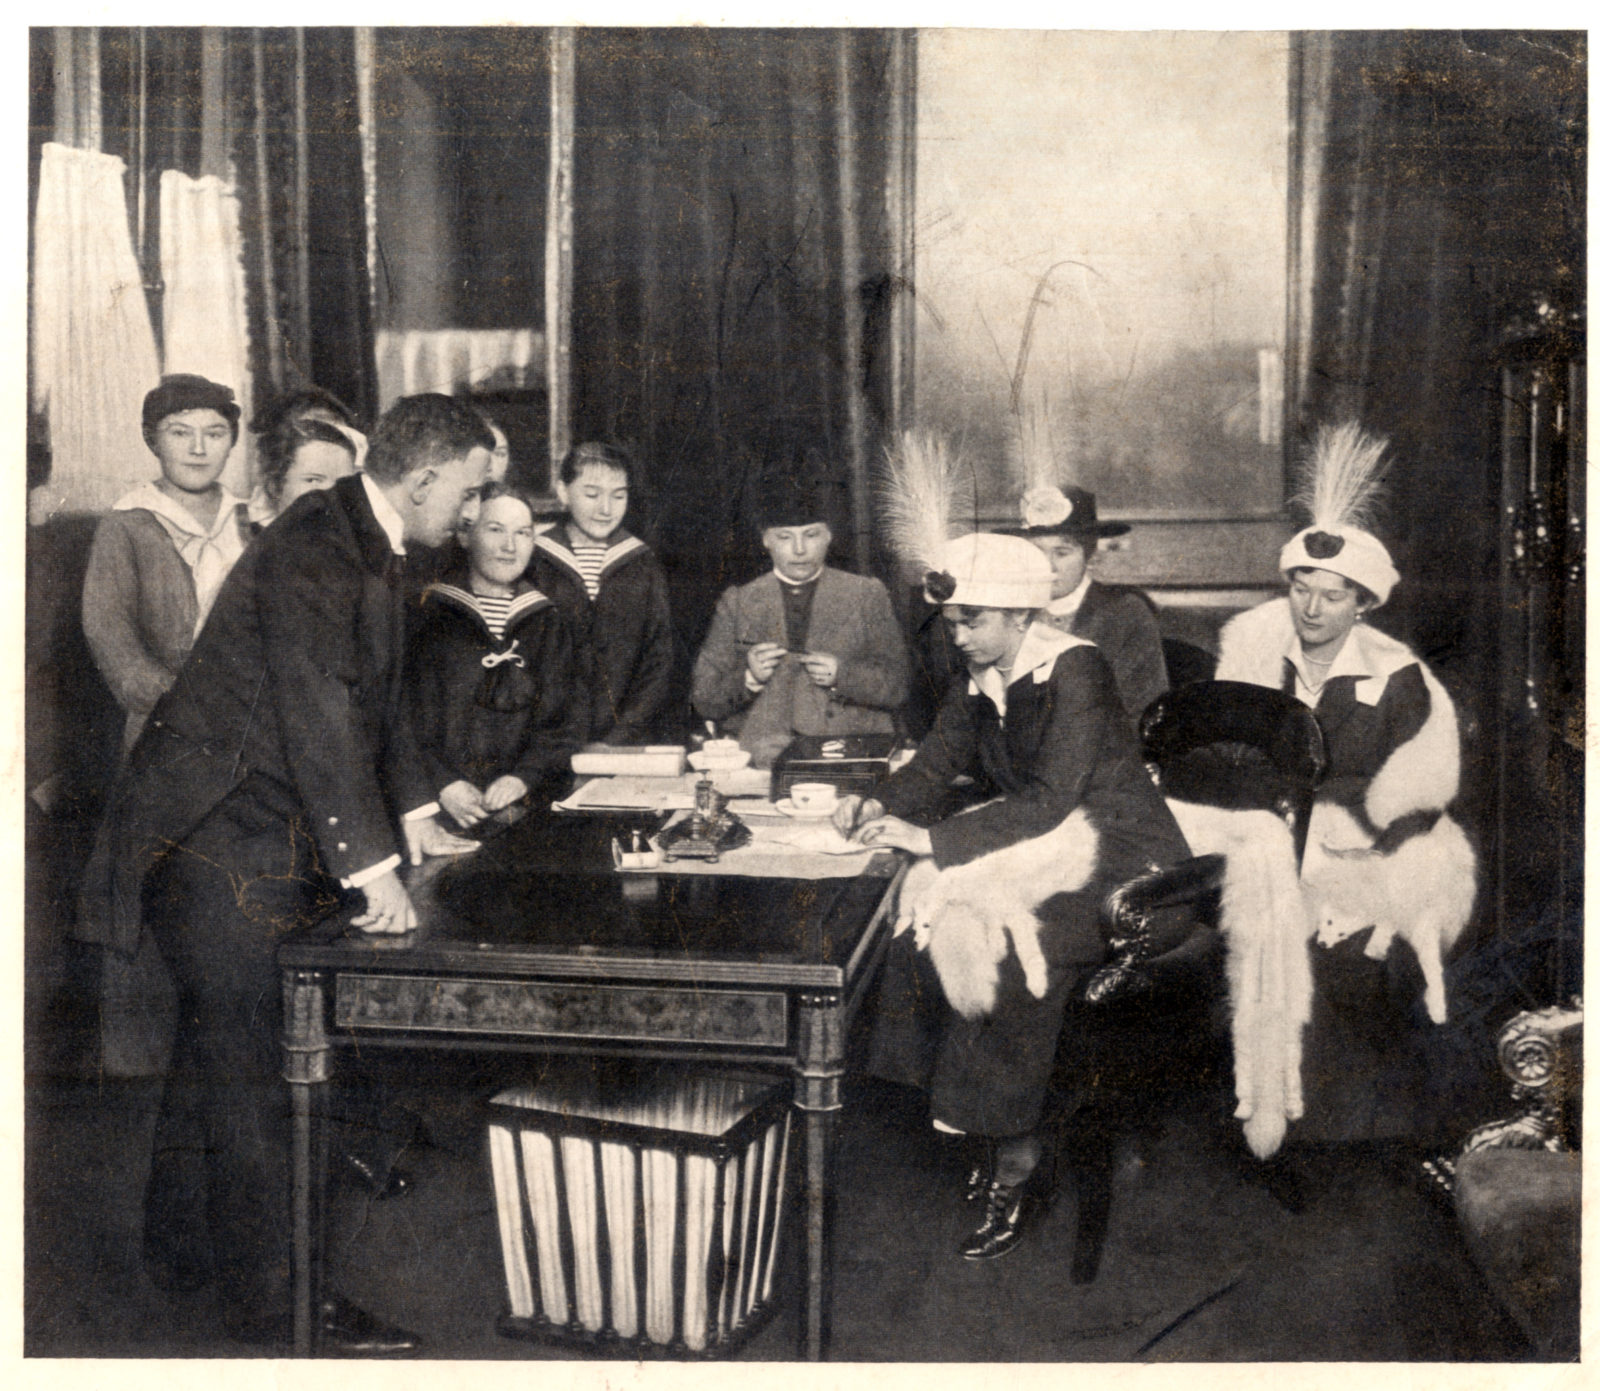 Grand Duchesses Olga and Tatiana